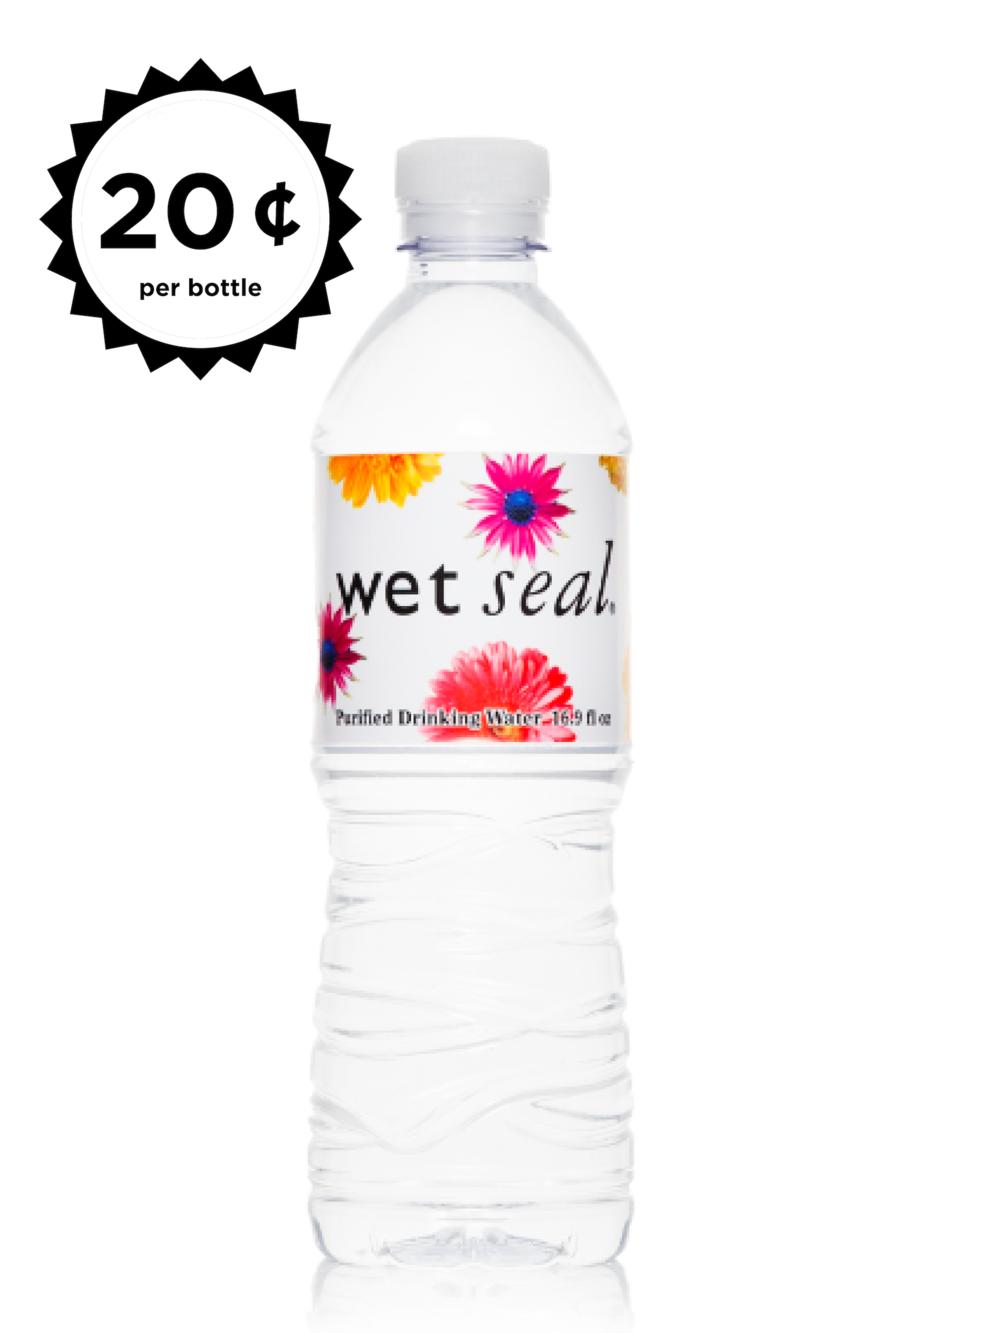 Specials-bottle